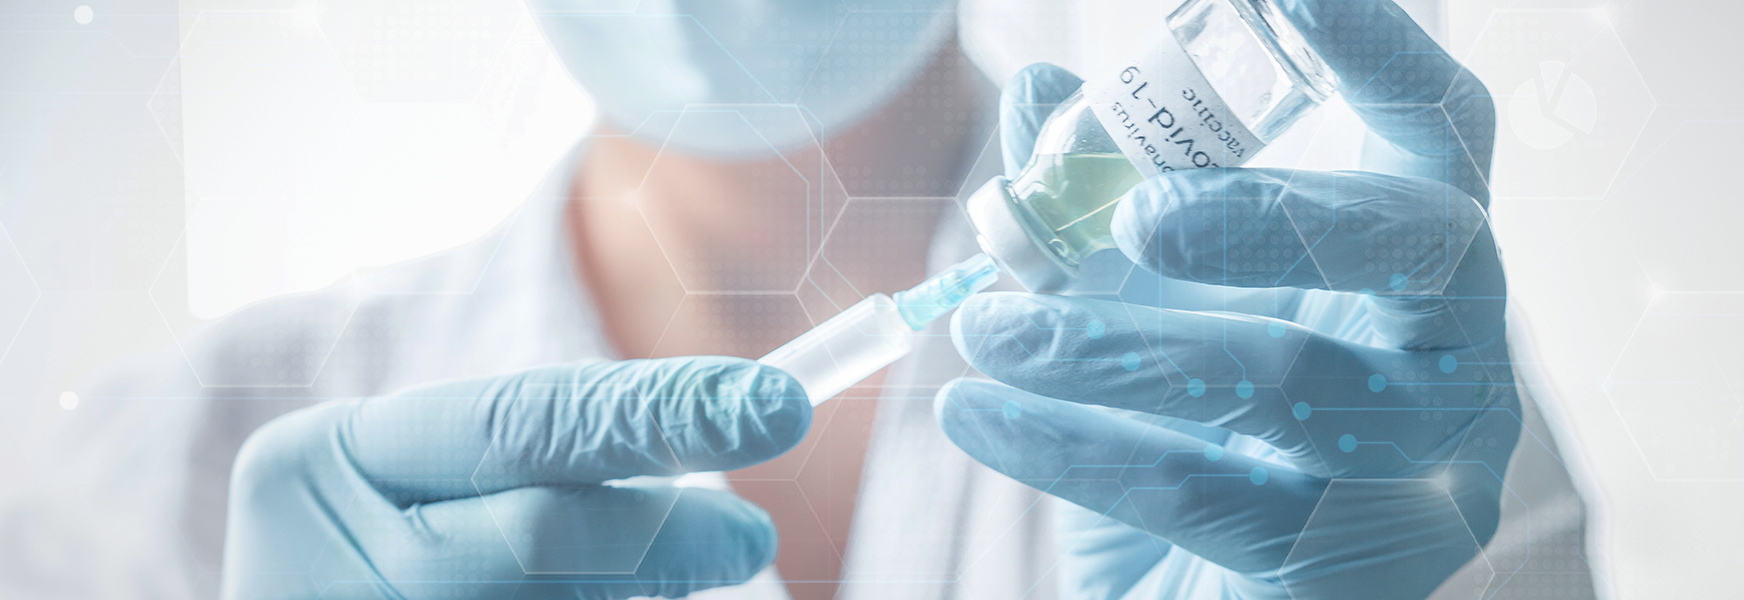 Healthcare worker prepares COVID-19 vaccine